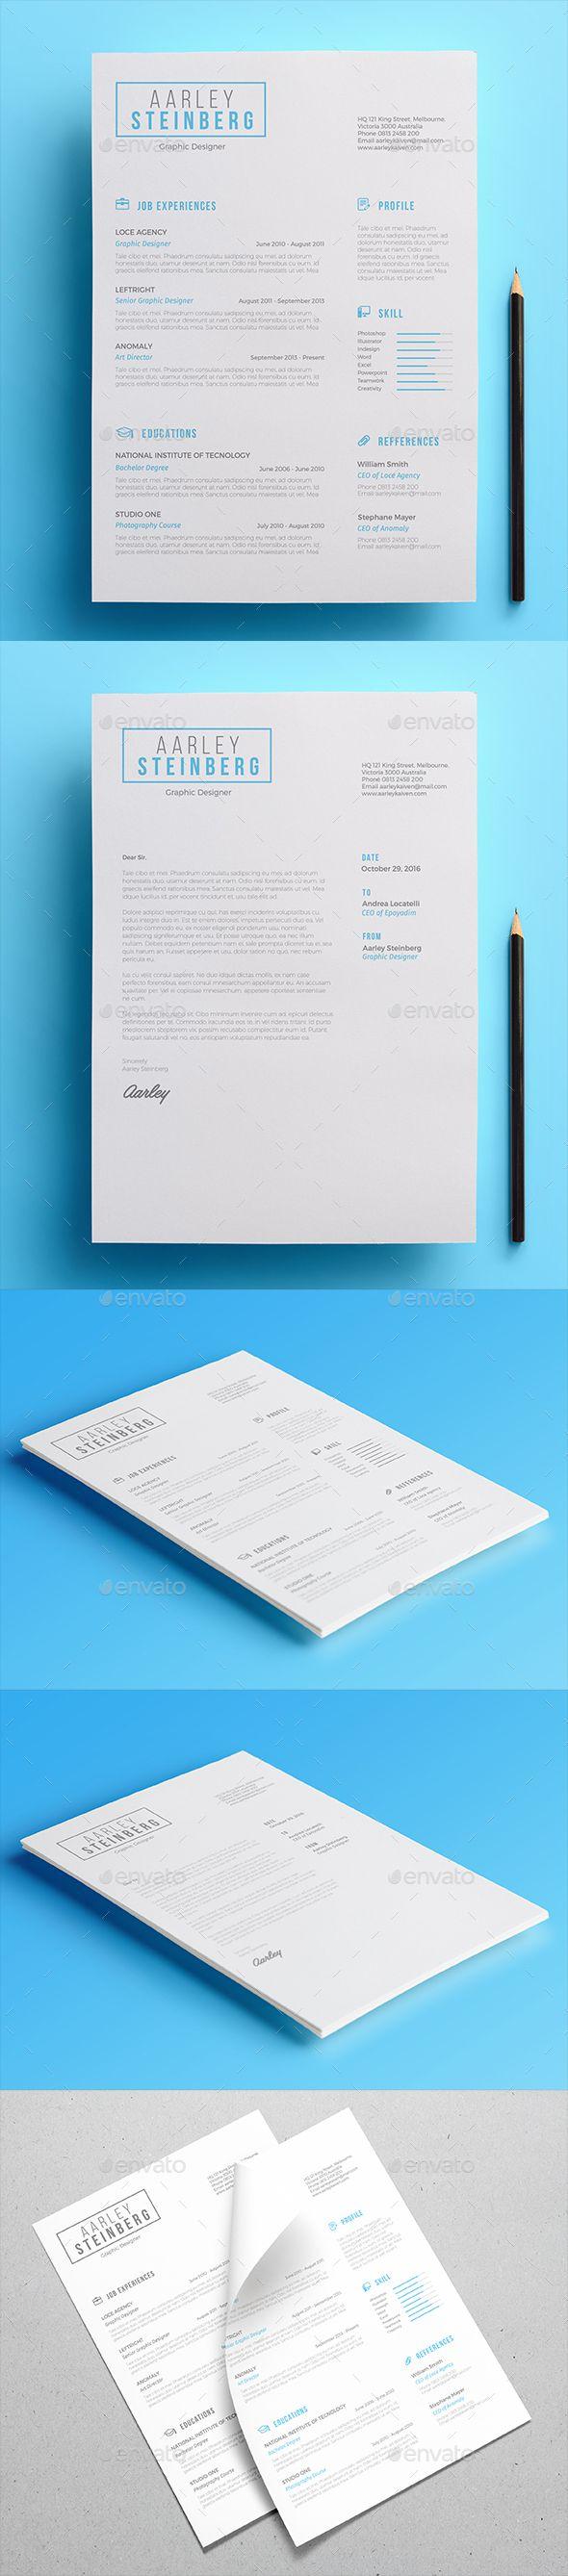 minimal resume resumes stationery here minimal resume 02 resumes stationery here